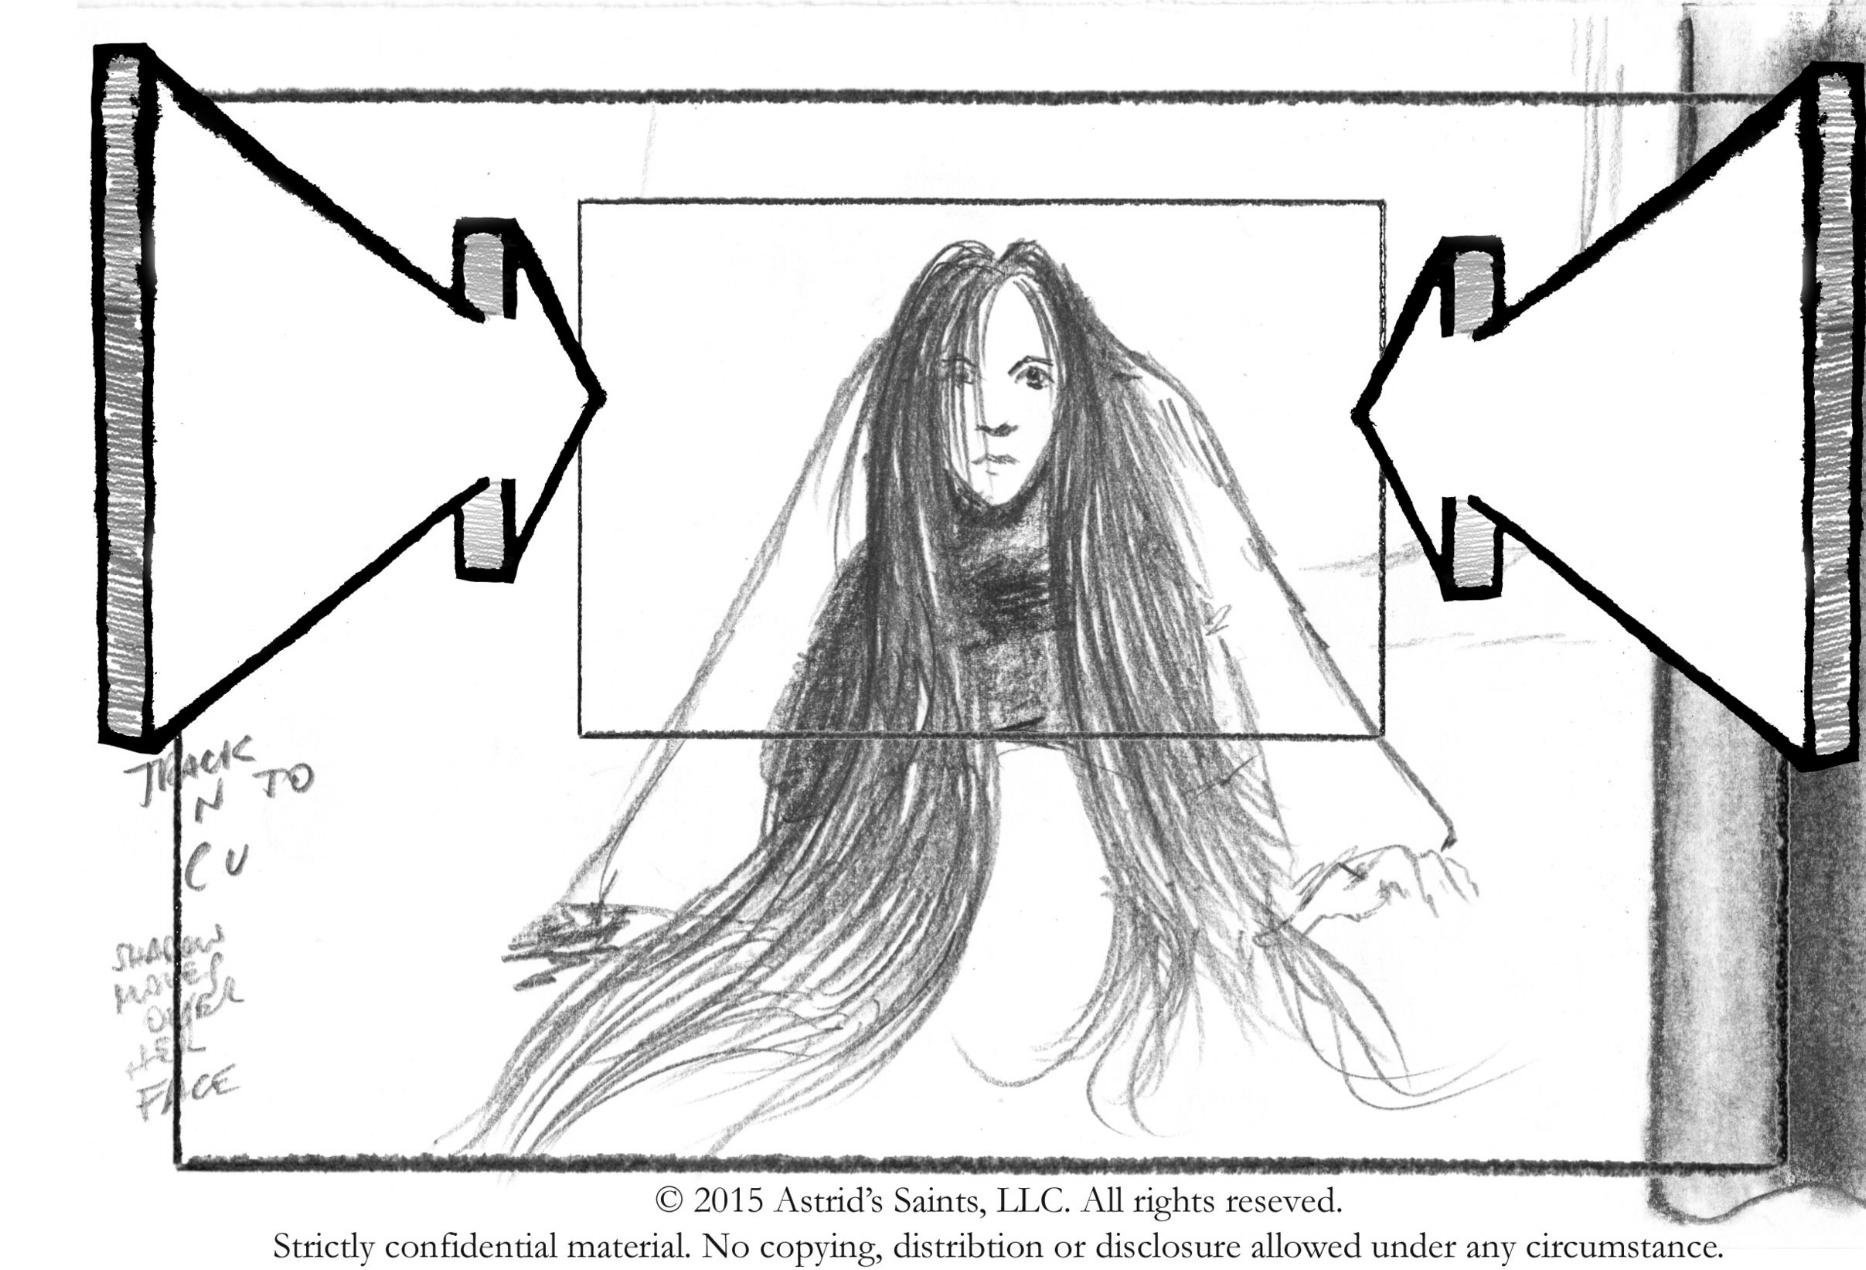 LADY M 5.1 STORYBOARD by Mariano Baino page 9 JPG.jpg